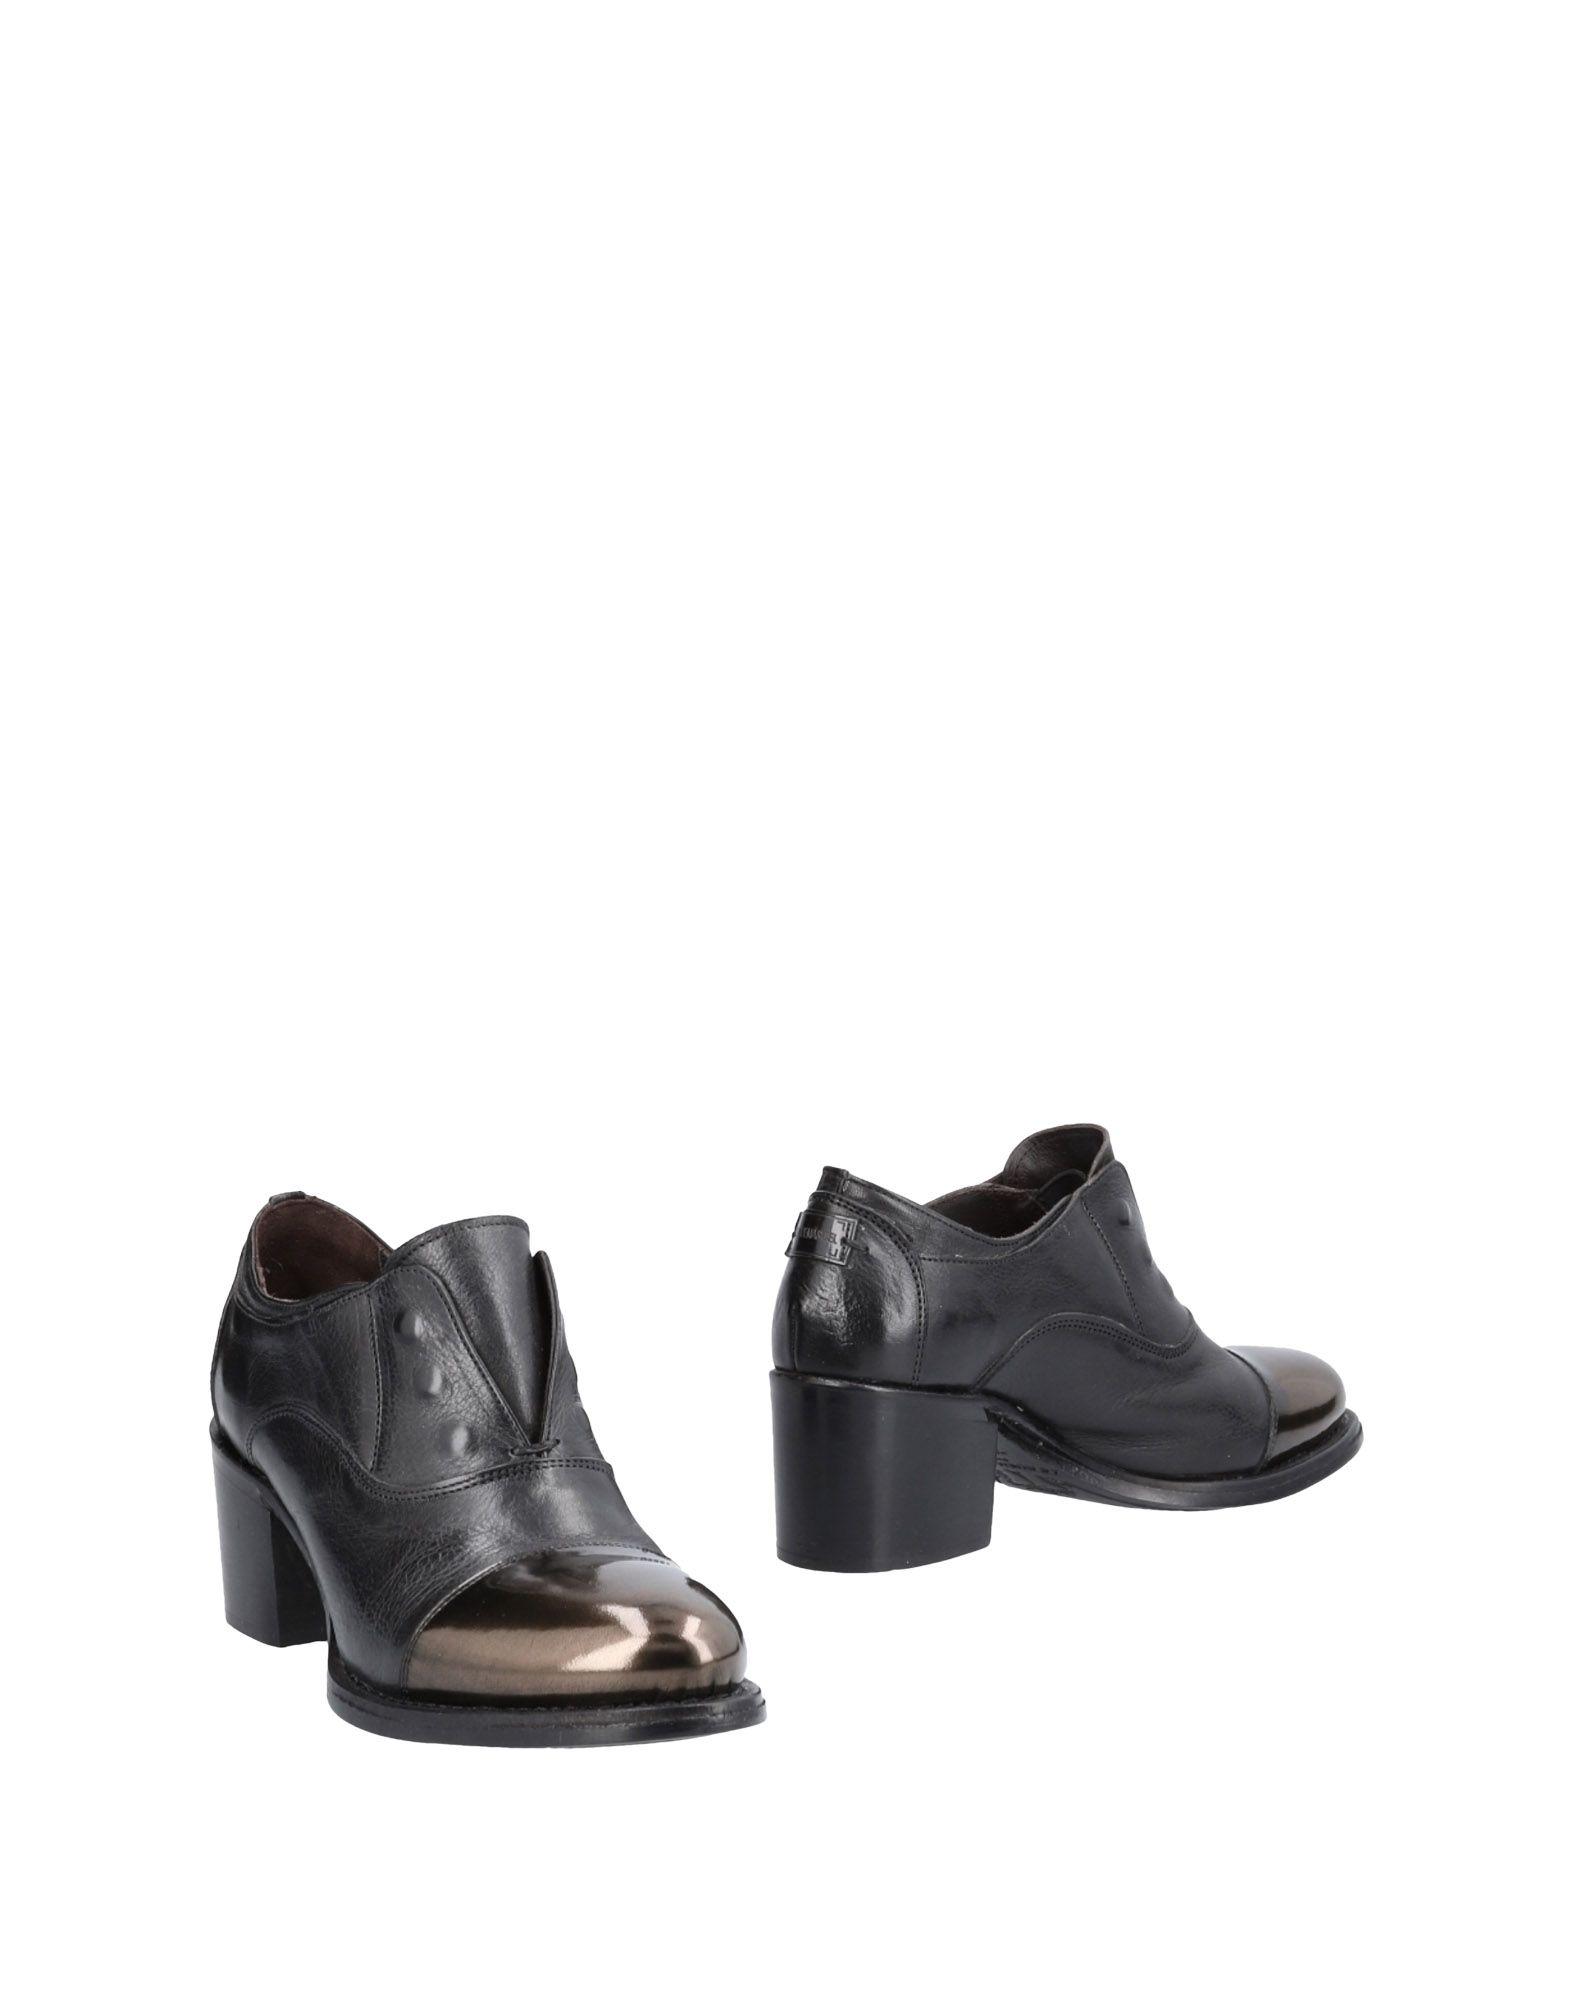 LE RUEMARCEL Ankle Boot in Black